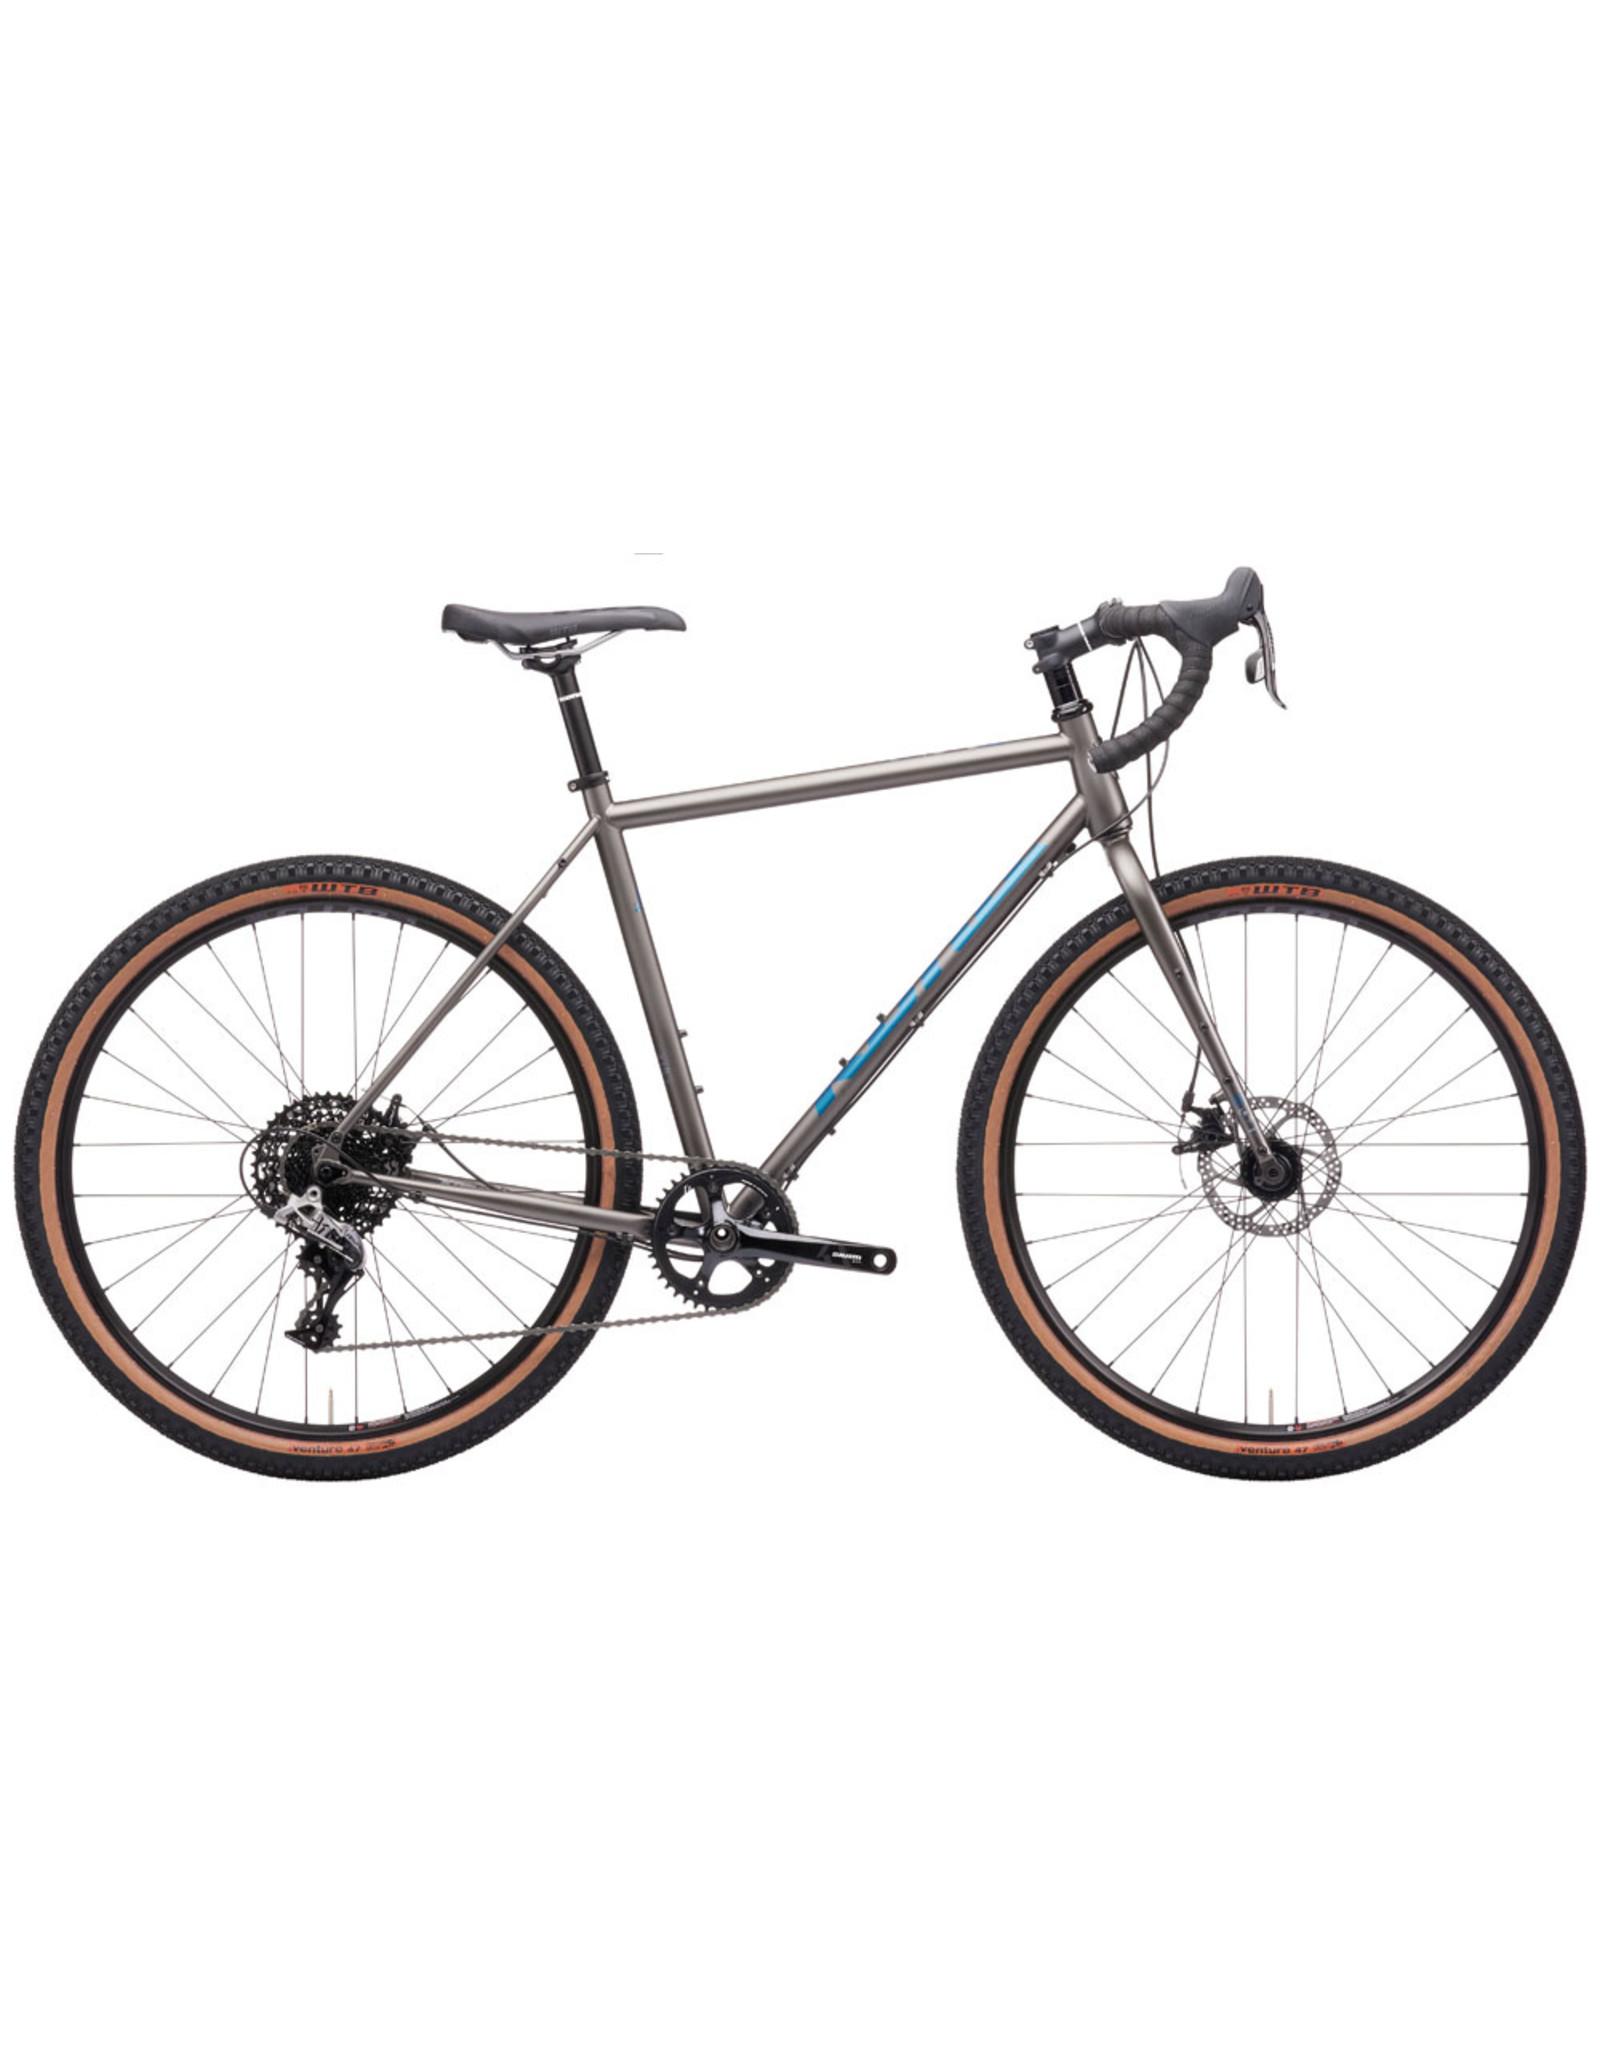 2021 rove dl gray 50cm